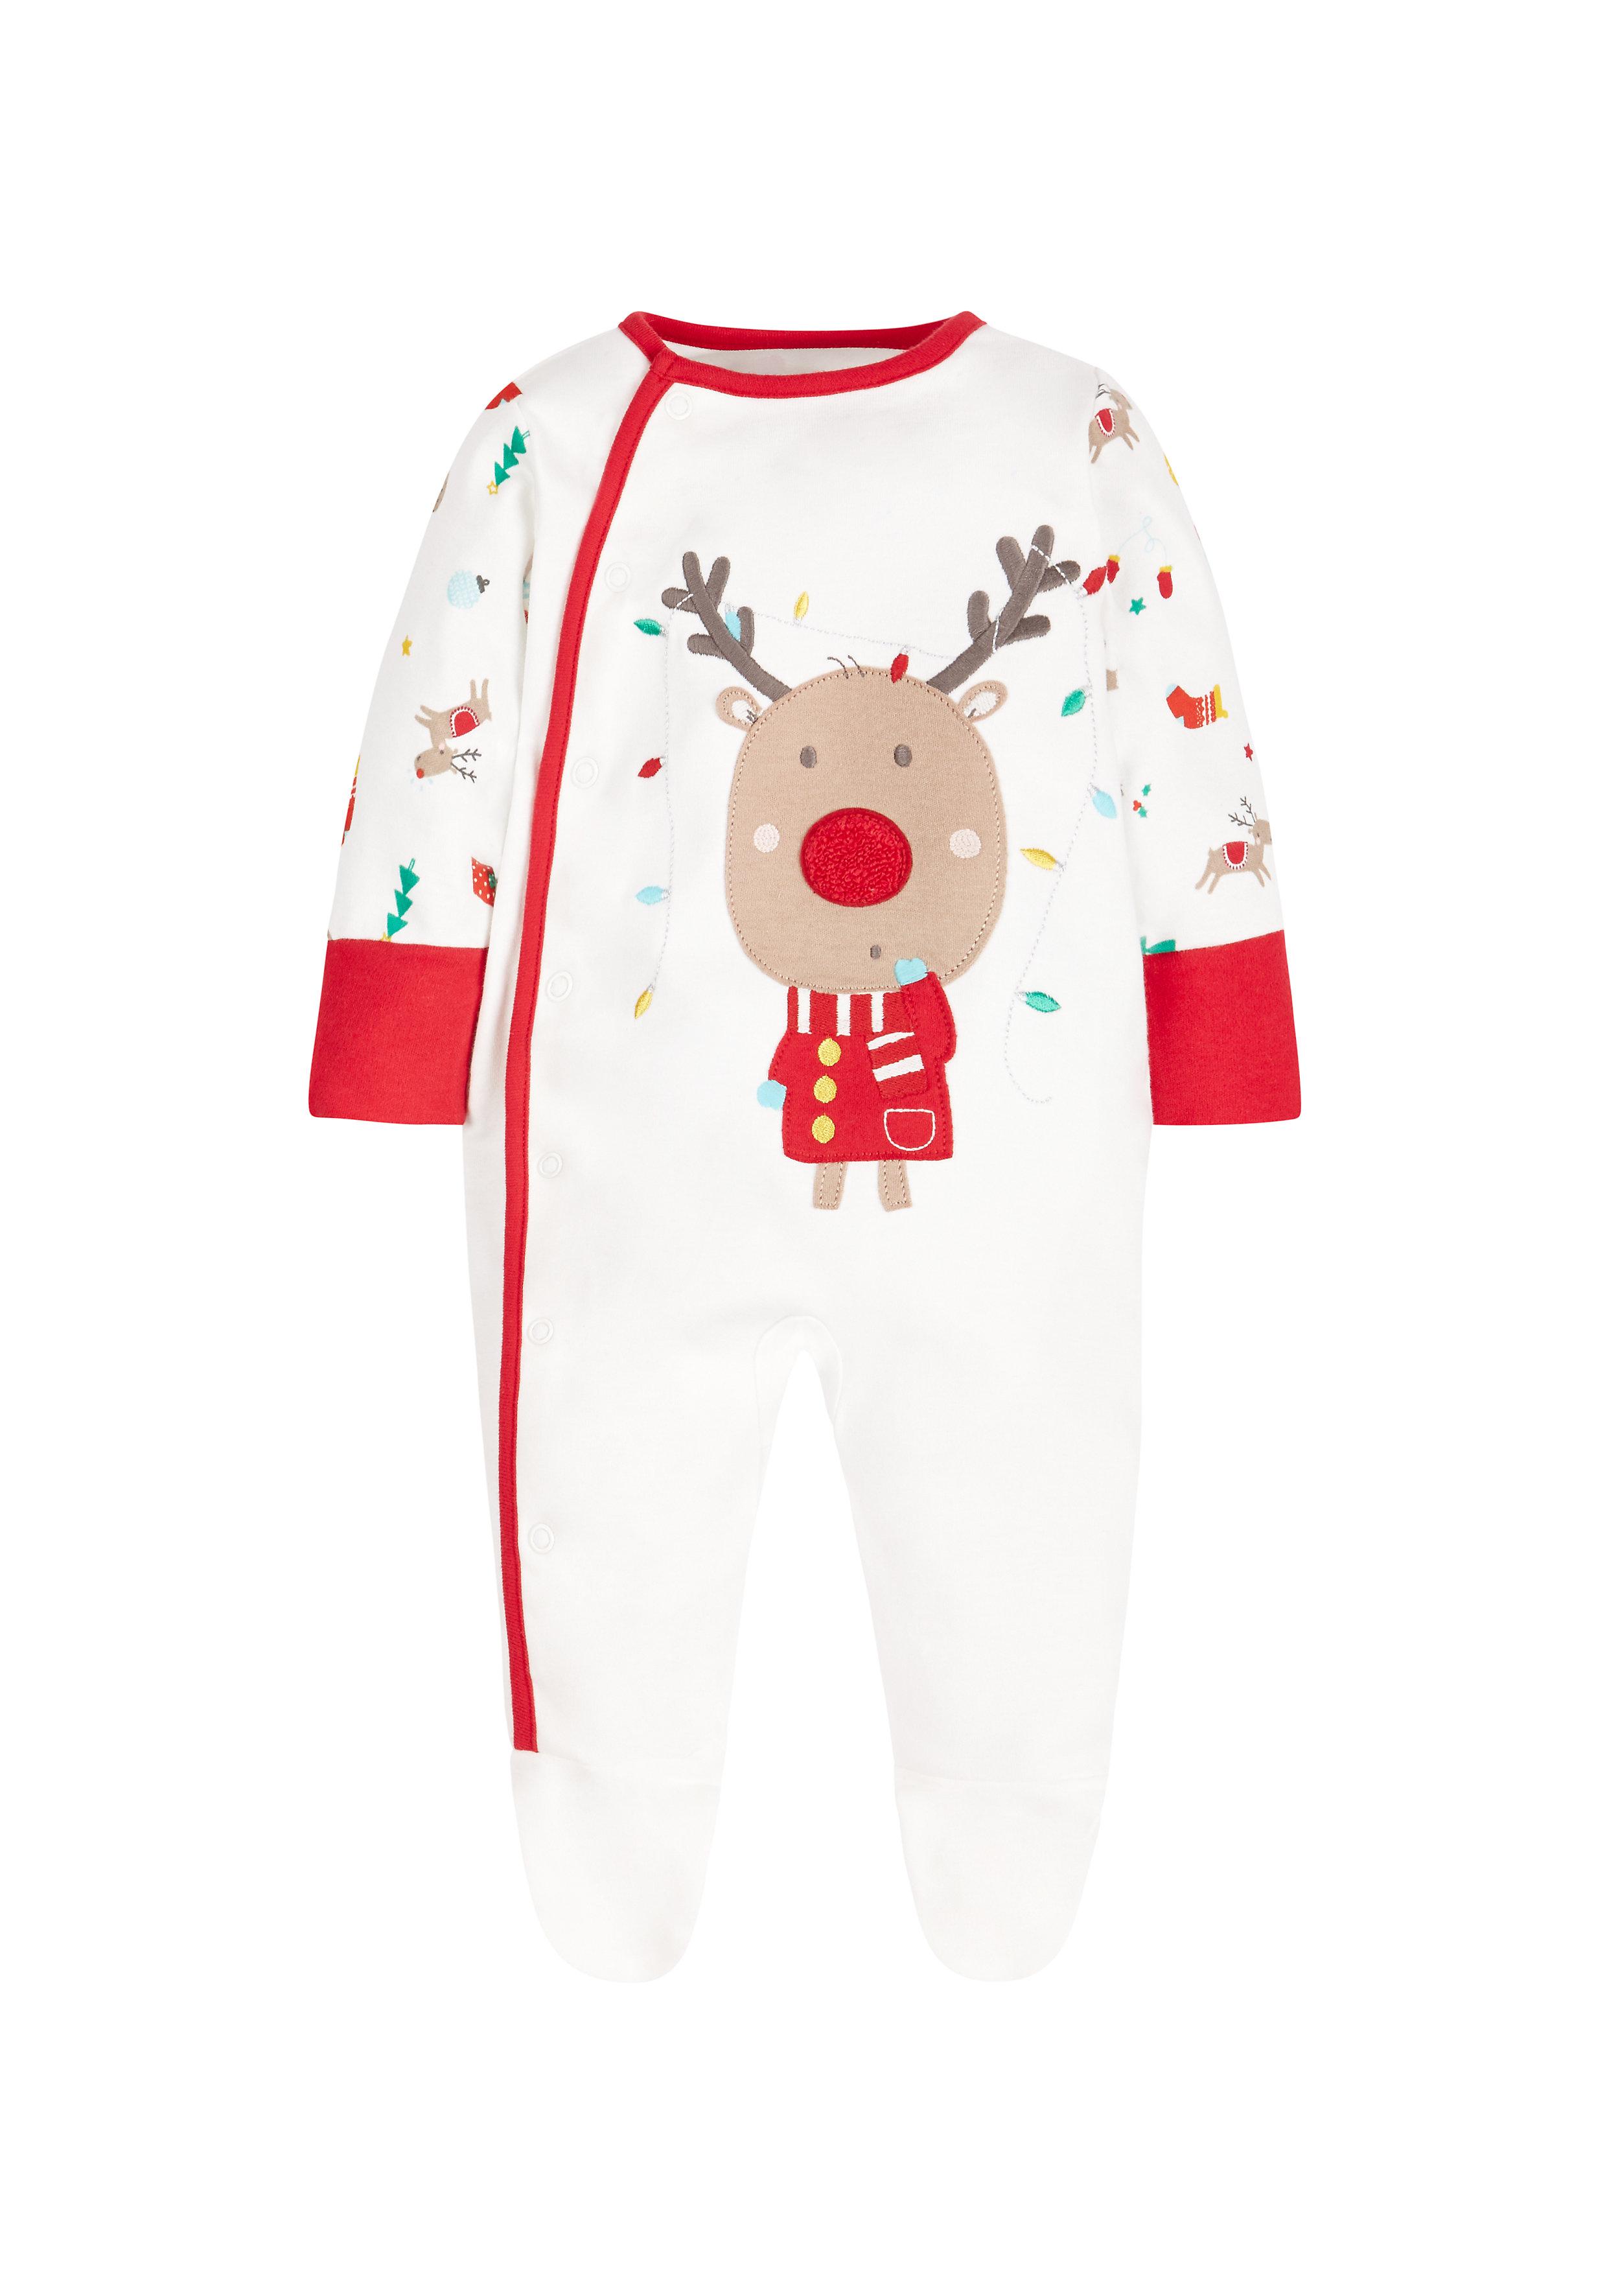 Mothercare | Unisex Full Sleeves Sleepsuits Reindeer Design - Cream